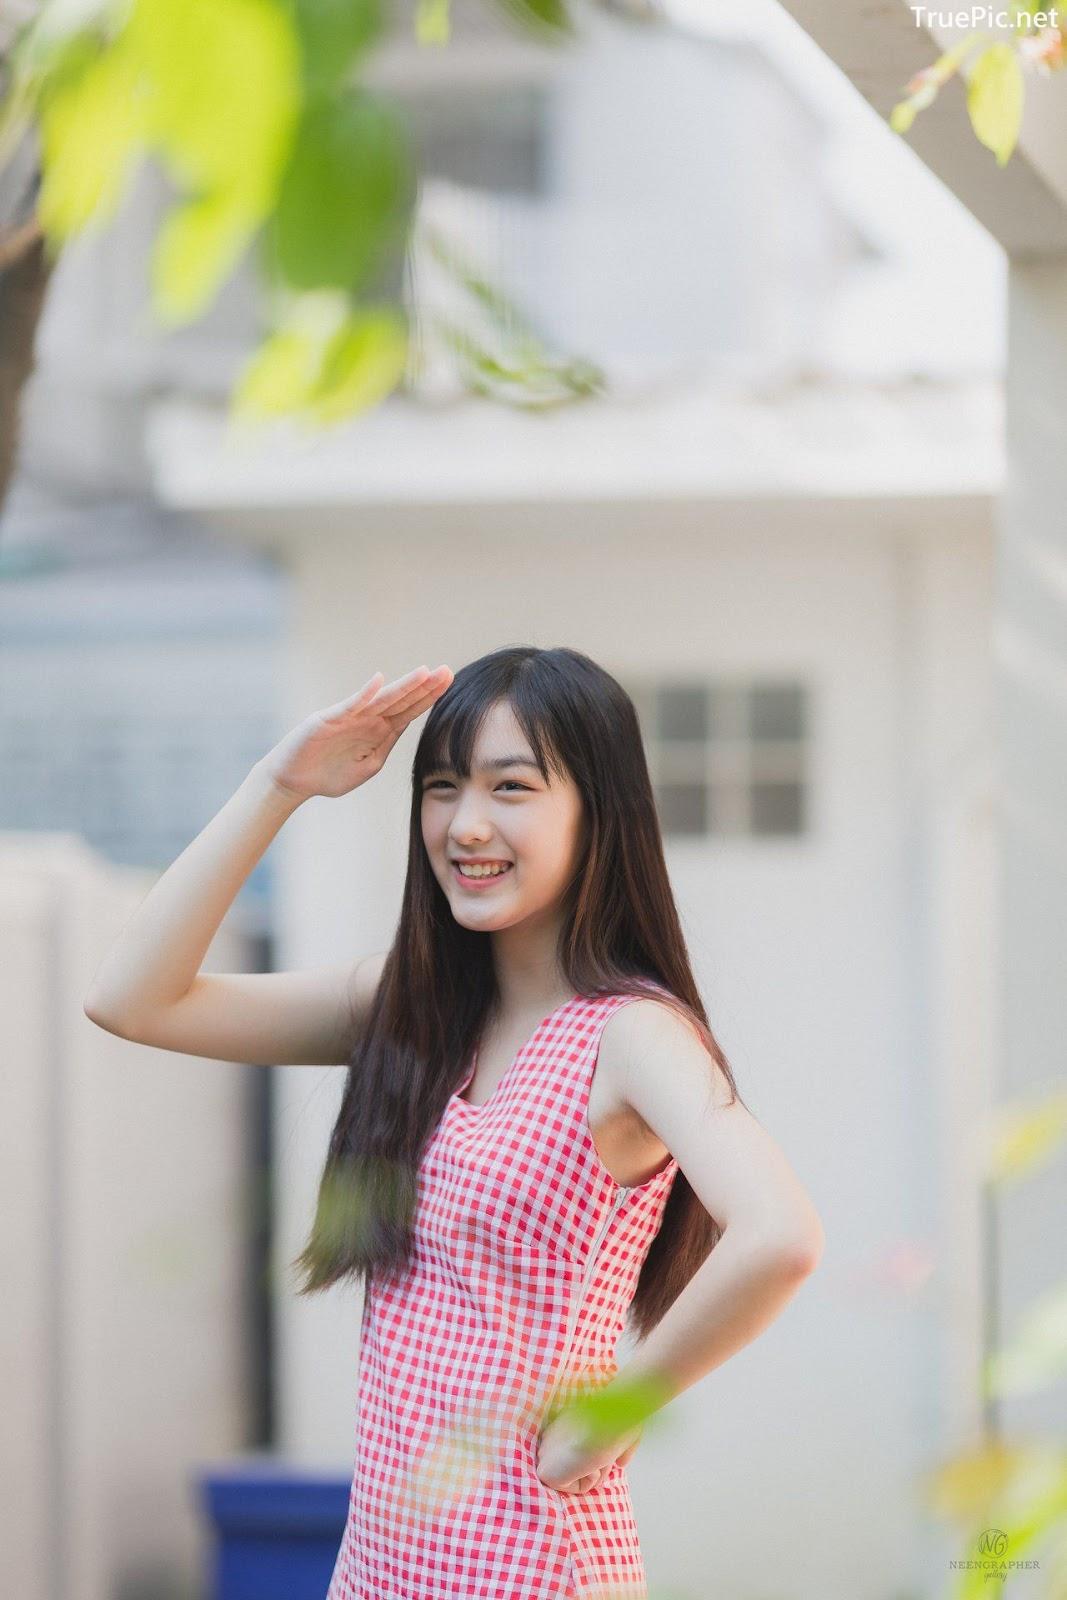 Image-Thailand-Cute-Model-Emma-Panisara–Album-Emma-Bright-Sunday-TruePic.net- Picture-30